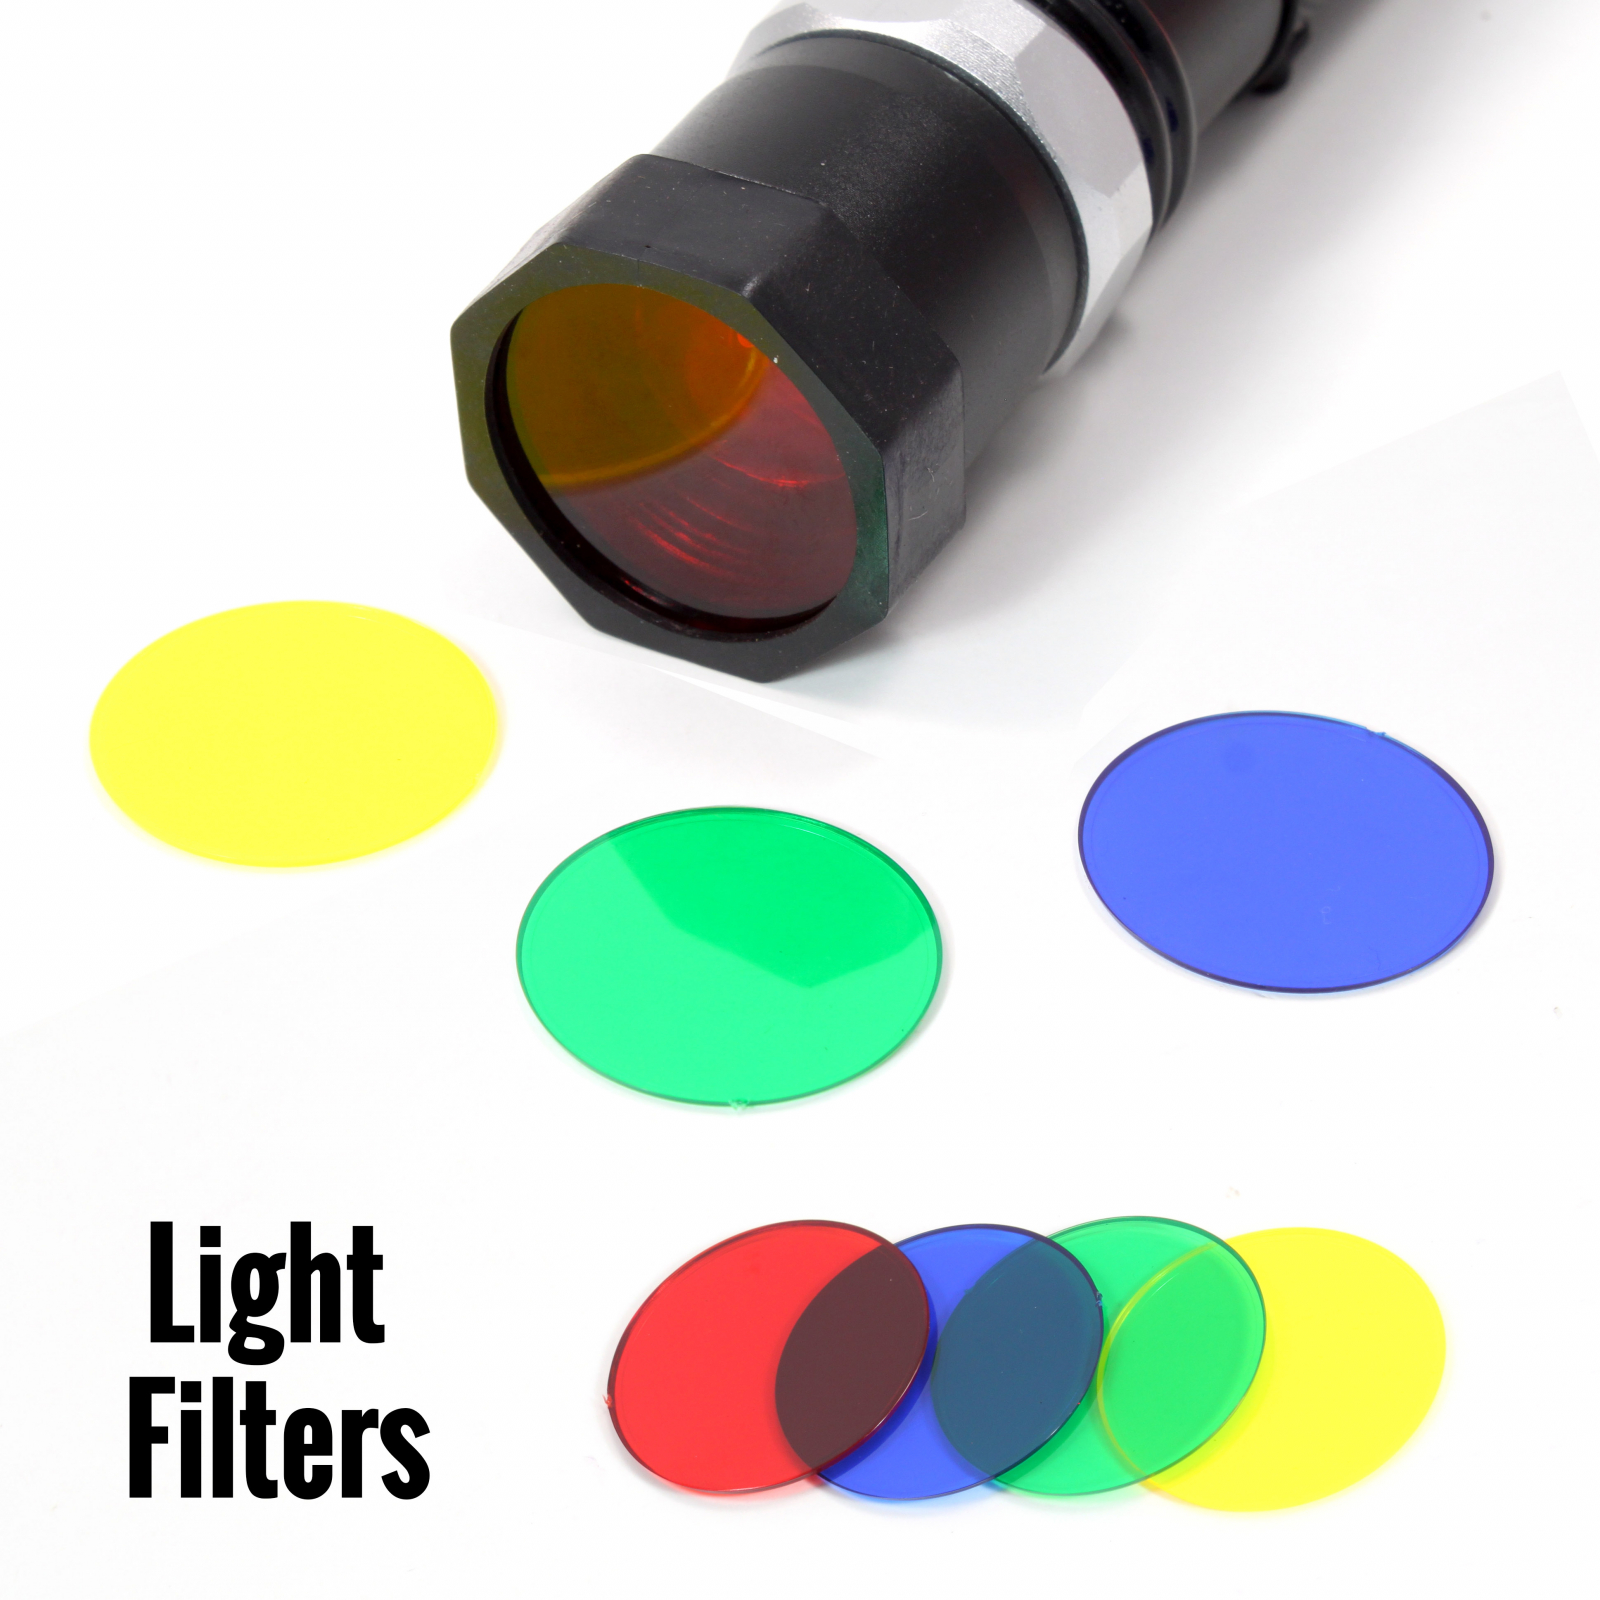 ASR Federal 10pc Adjustable Rechargeable LED Flashlight Set